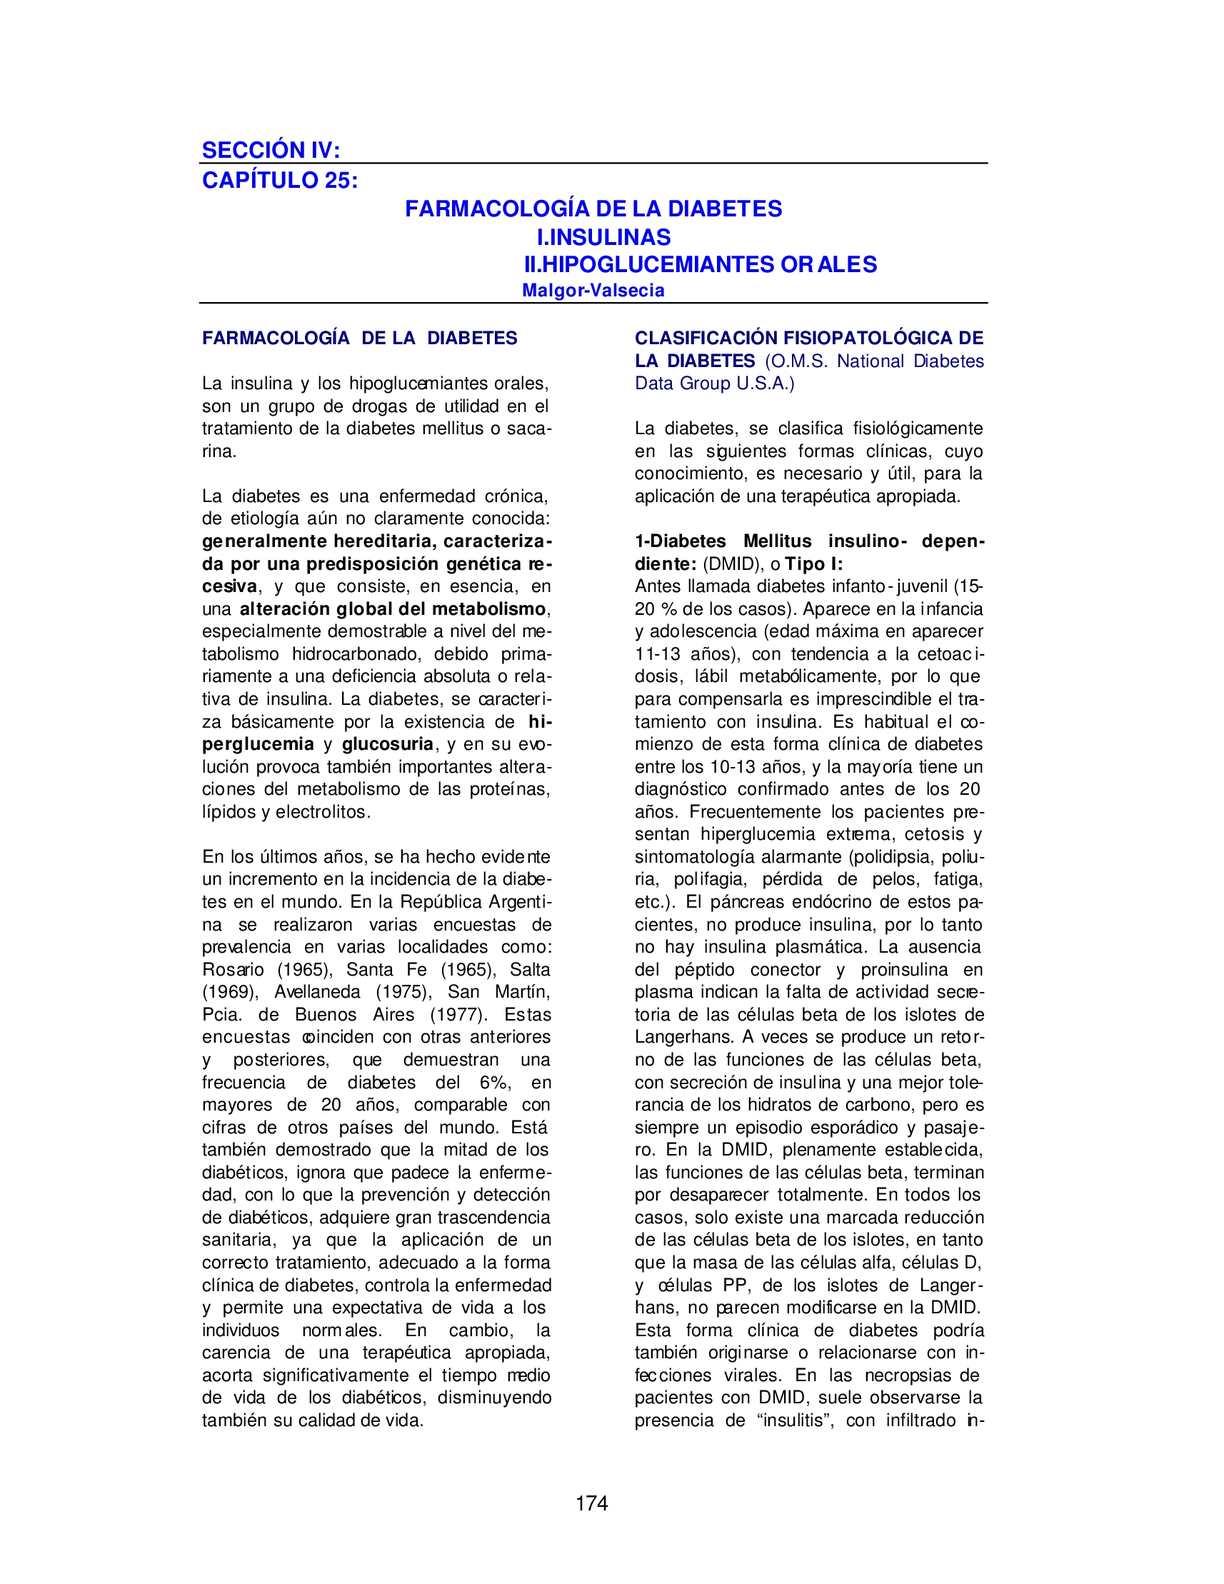 diagnóstico de deficiencia de carboxilasa múltiple de diabetes